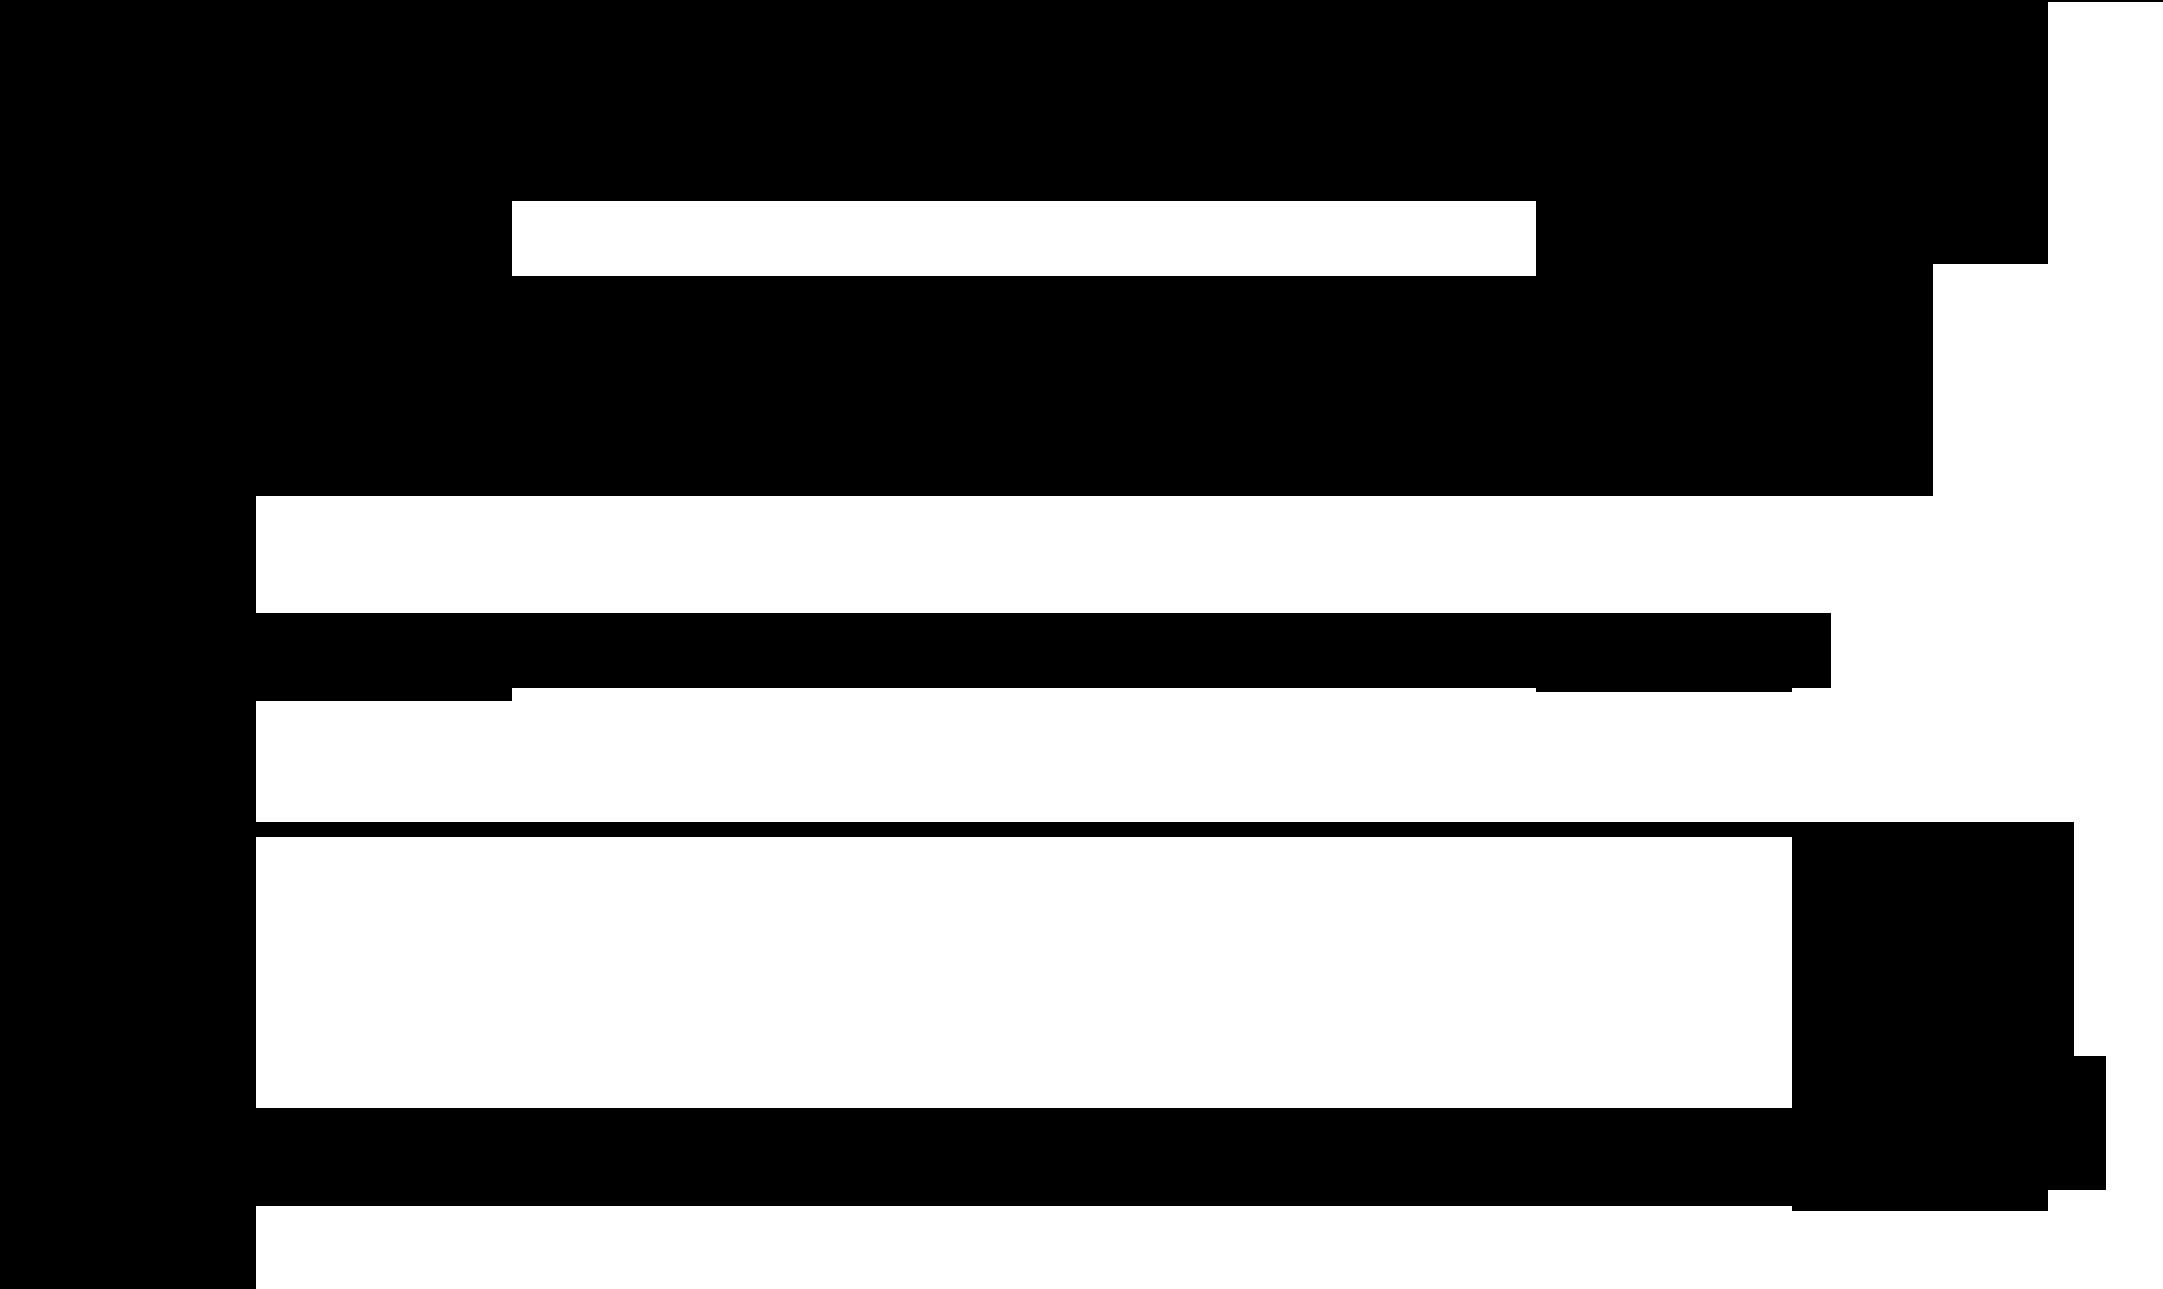 ССВ 30-2700-К50